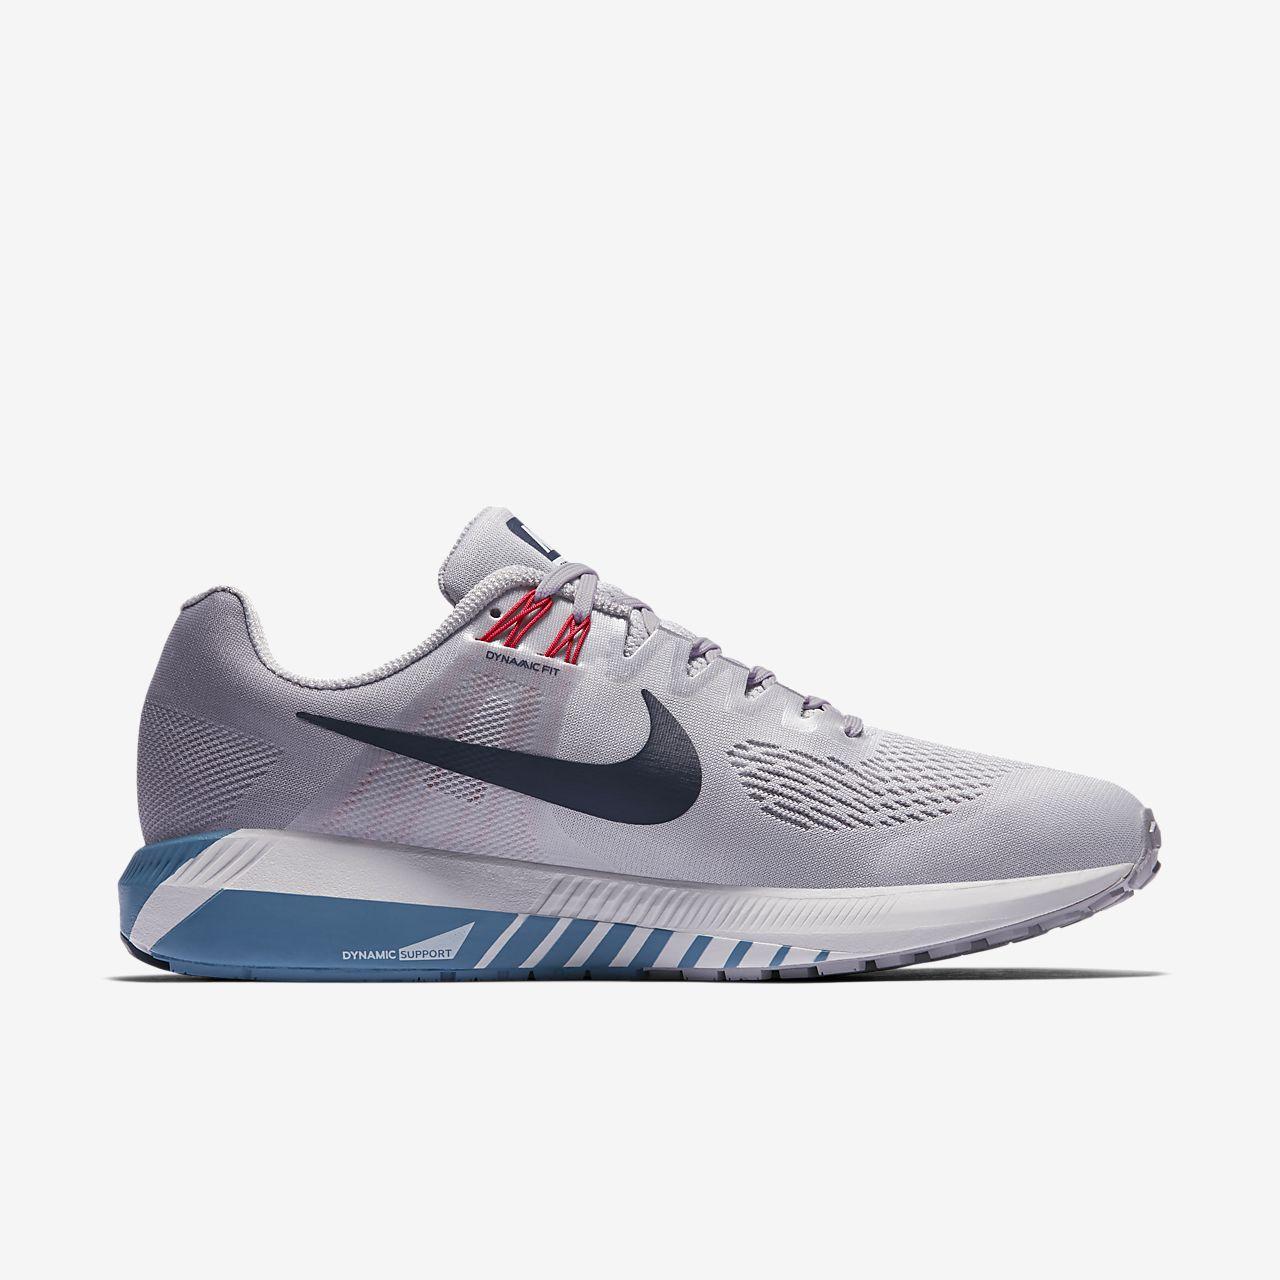 e160772b1fdfe Nike Air Zoom Structure 21 Zapatillas de Running para Hombre iVLsG ...